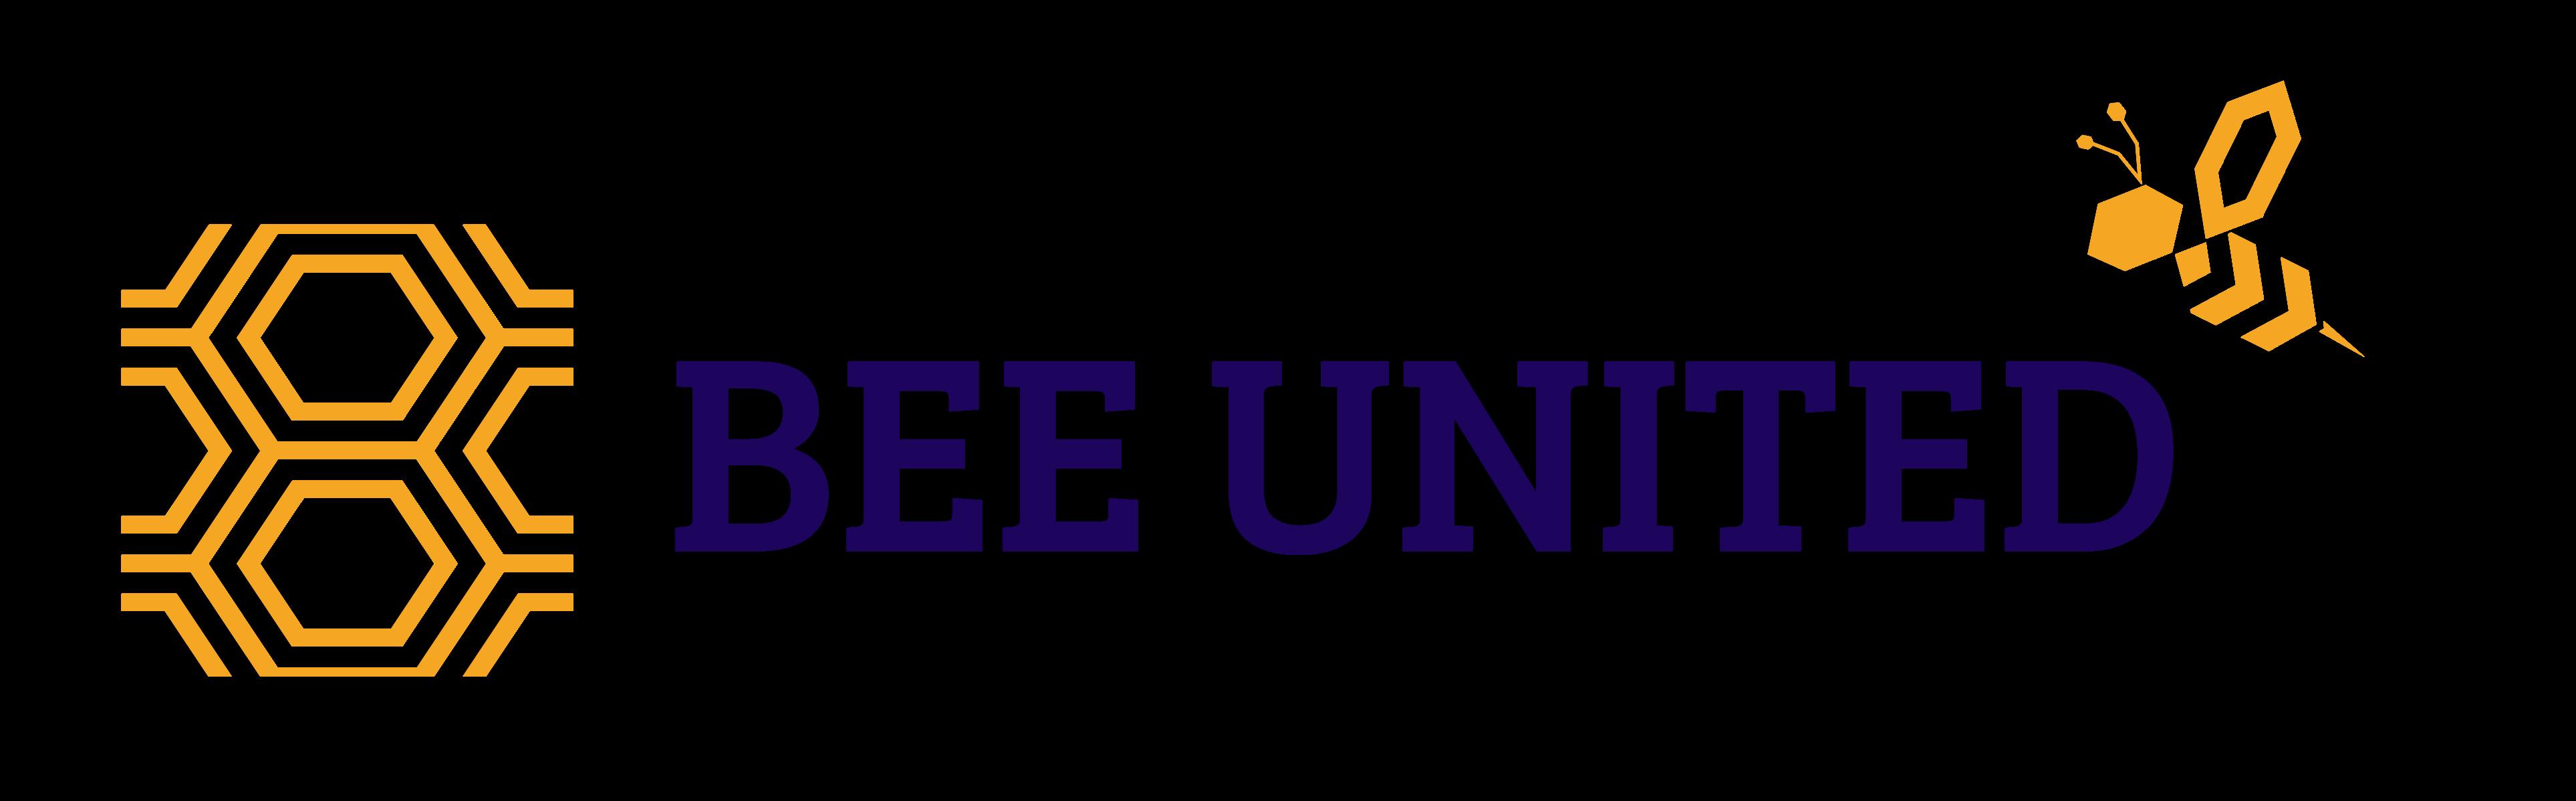 Apitherapie Webshop – Bee United